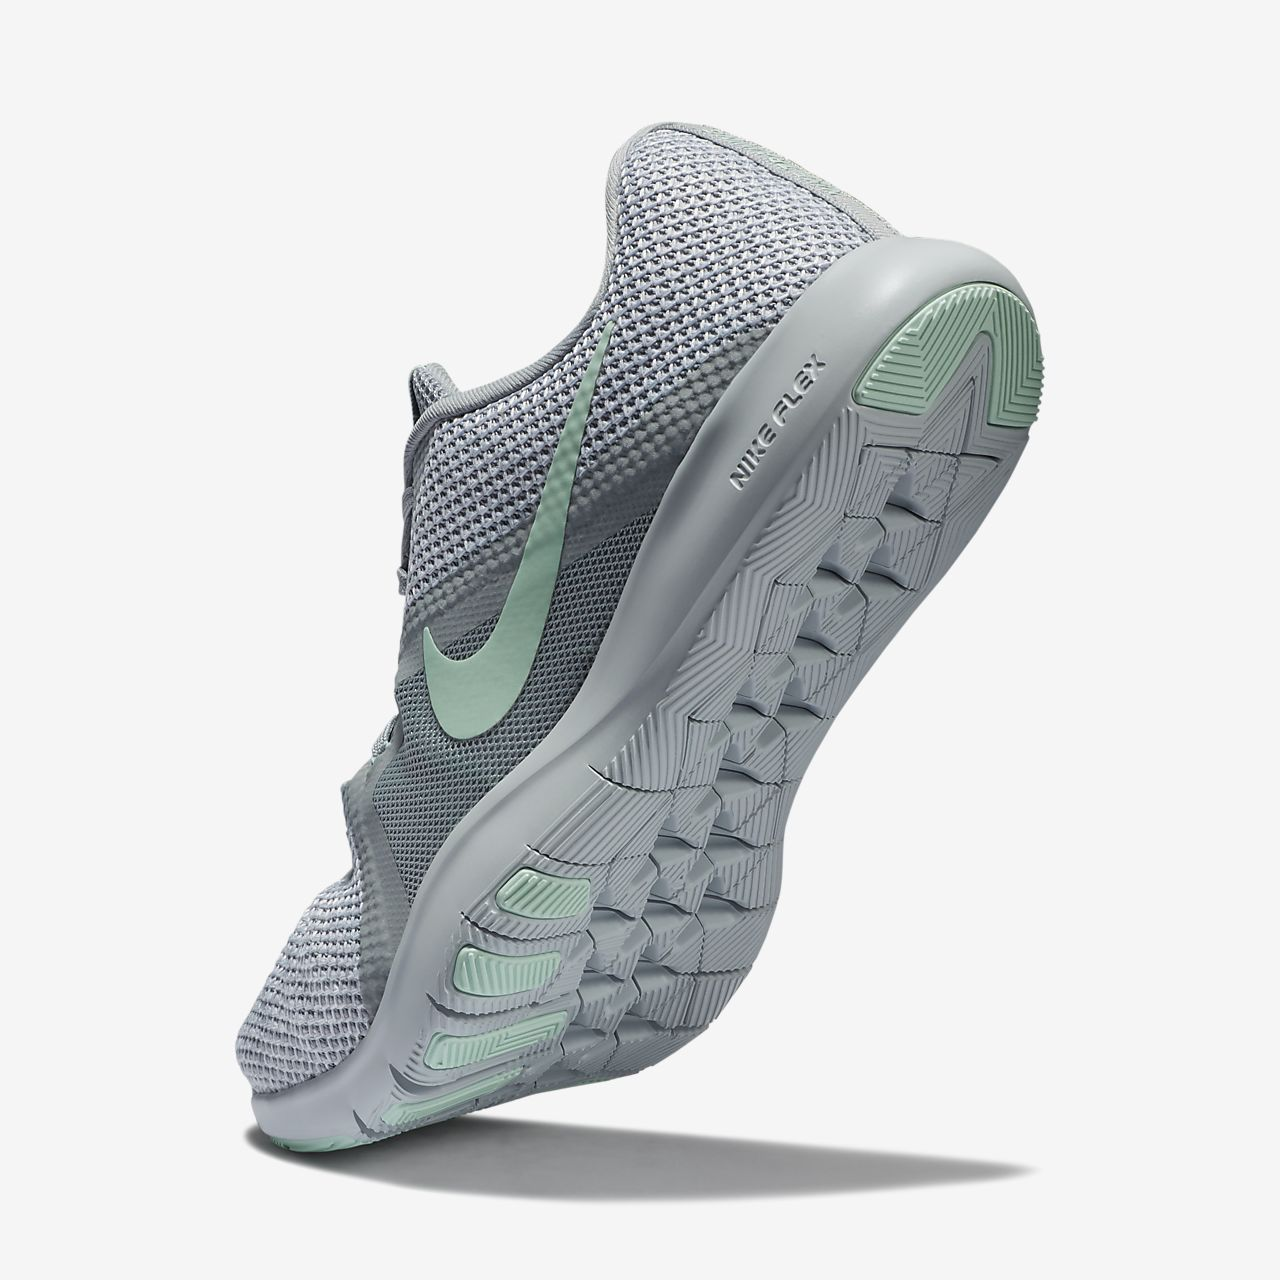 a295ab894eac9b Nike Flex Trainer 8 (Wide) Women s Training Shoe. Nike.com